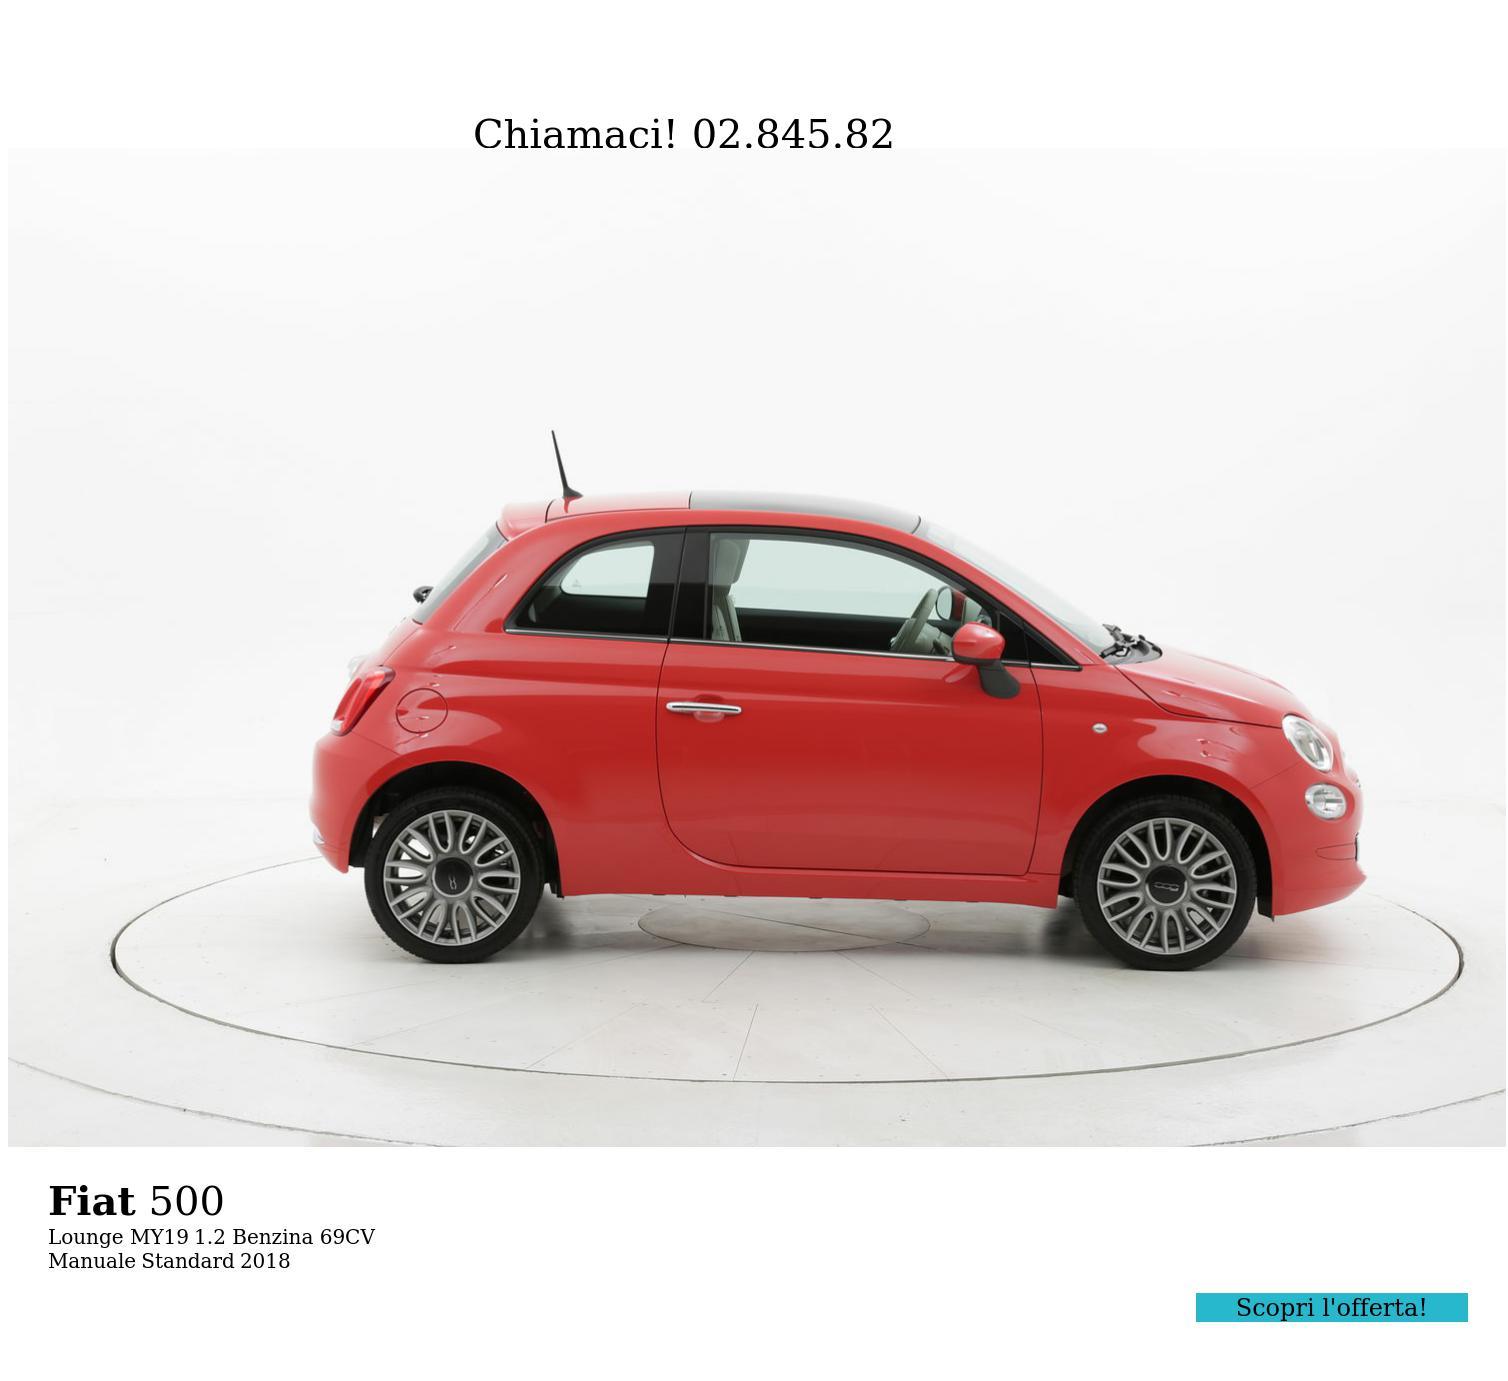 Fiat 500 Lounge MY19 km 0 benzina rossa | brumbrum